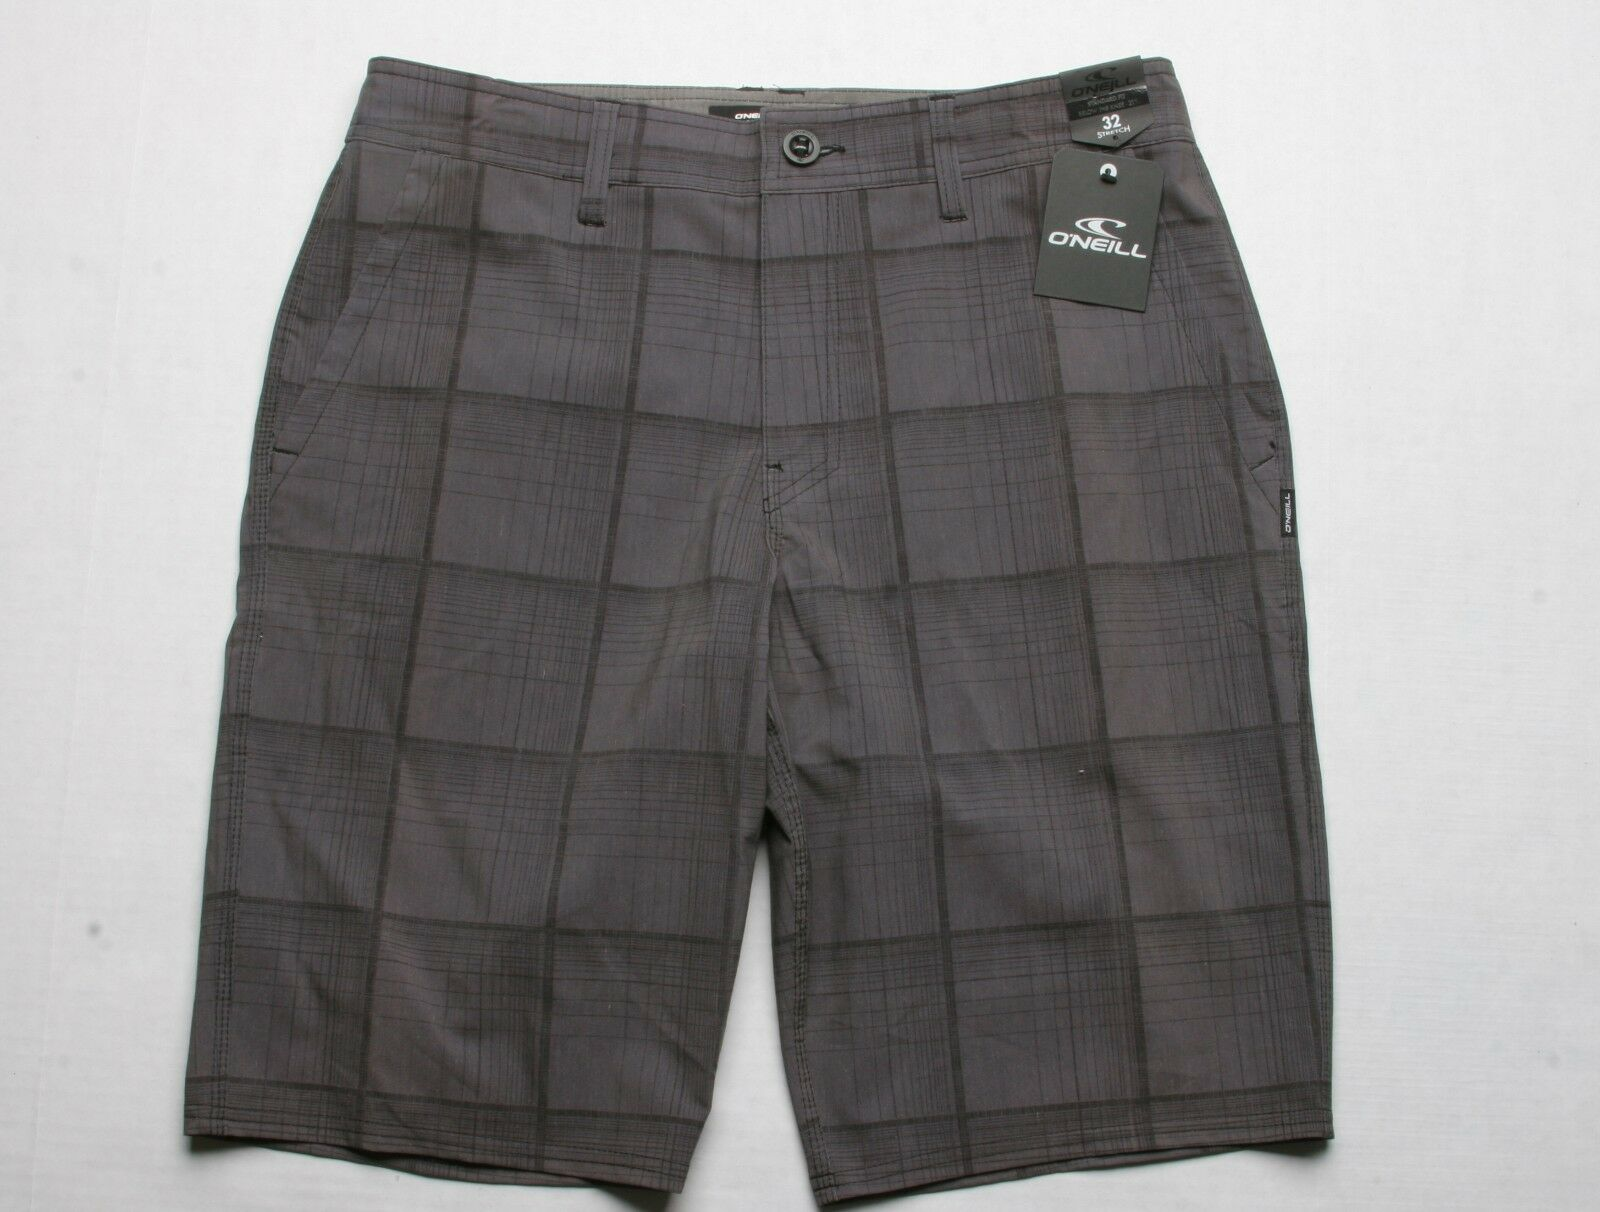 O'Neill Outsider Plaid Short (32) Dark Charcoal